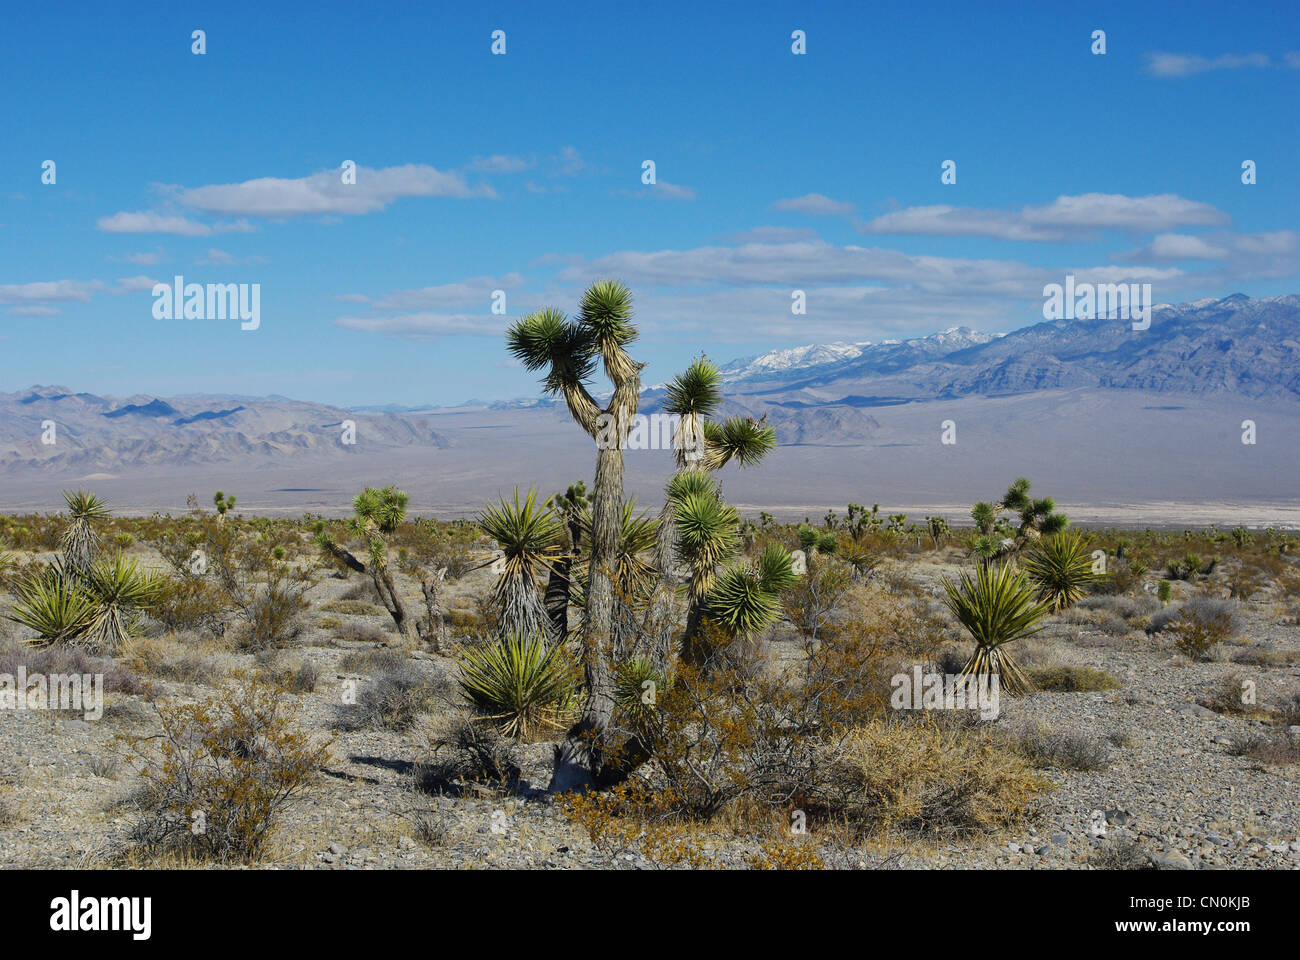 Joshua and yuccas, vast desert and high mountains near Mount Charleston, Nevada - Stock Image